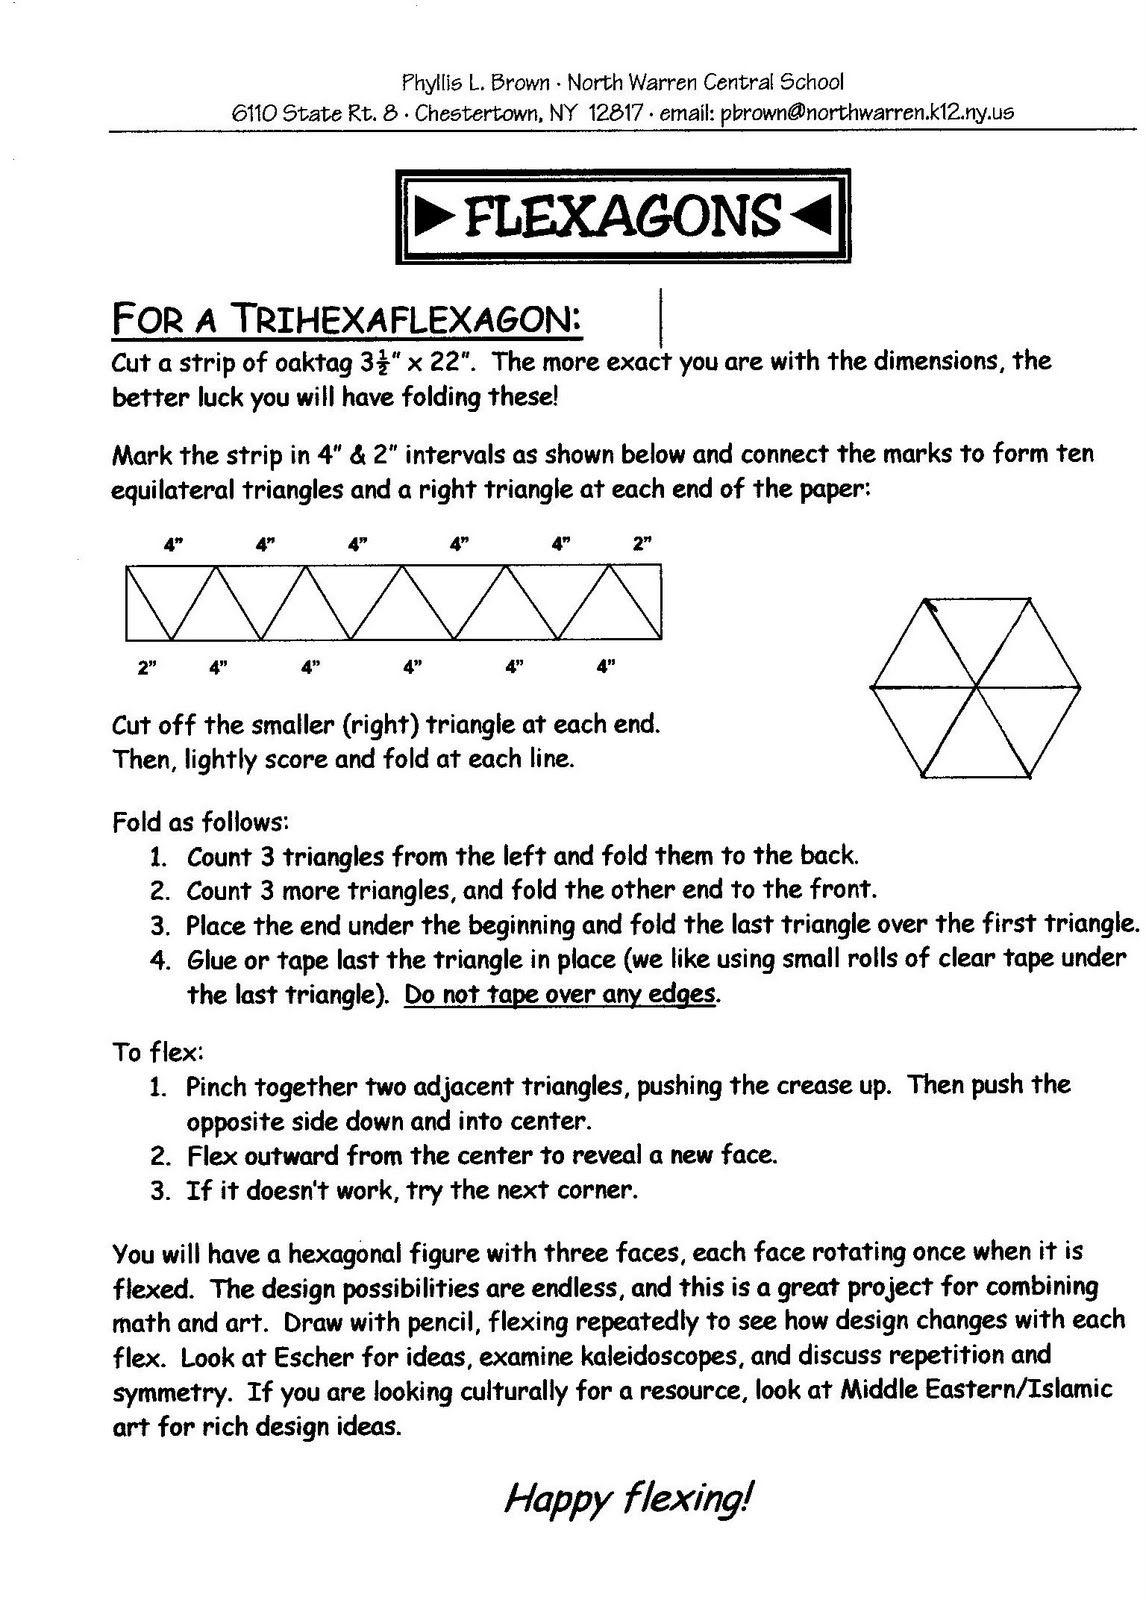 The Amazing Trihexaflexagon